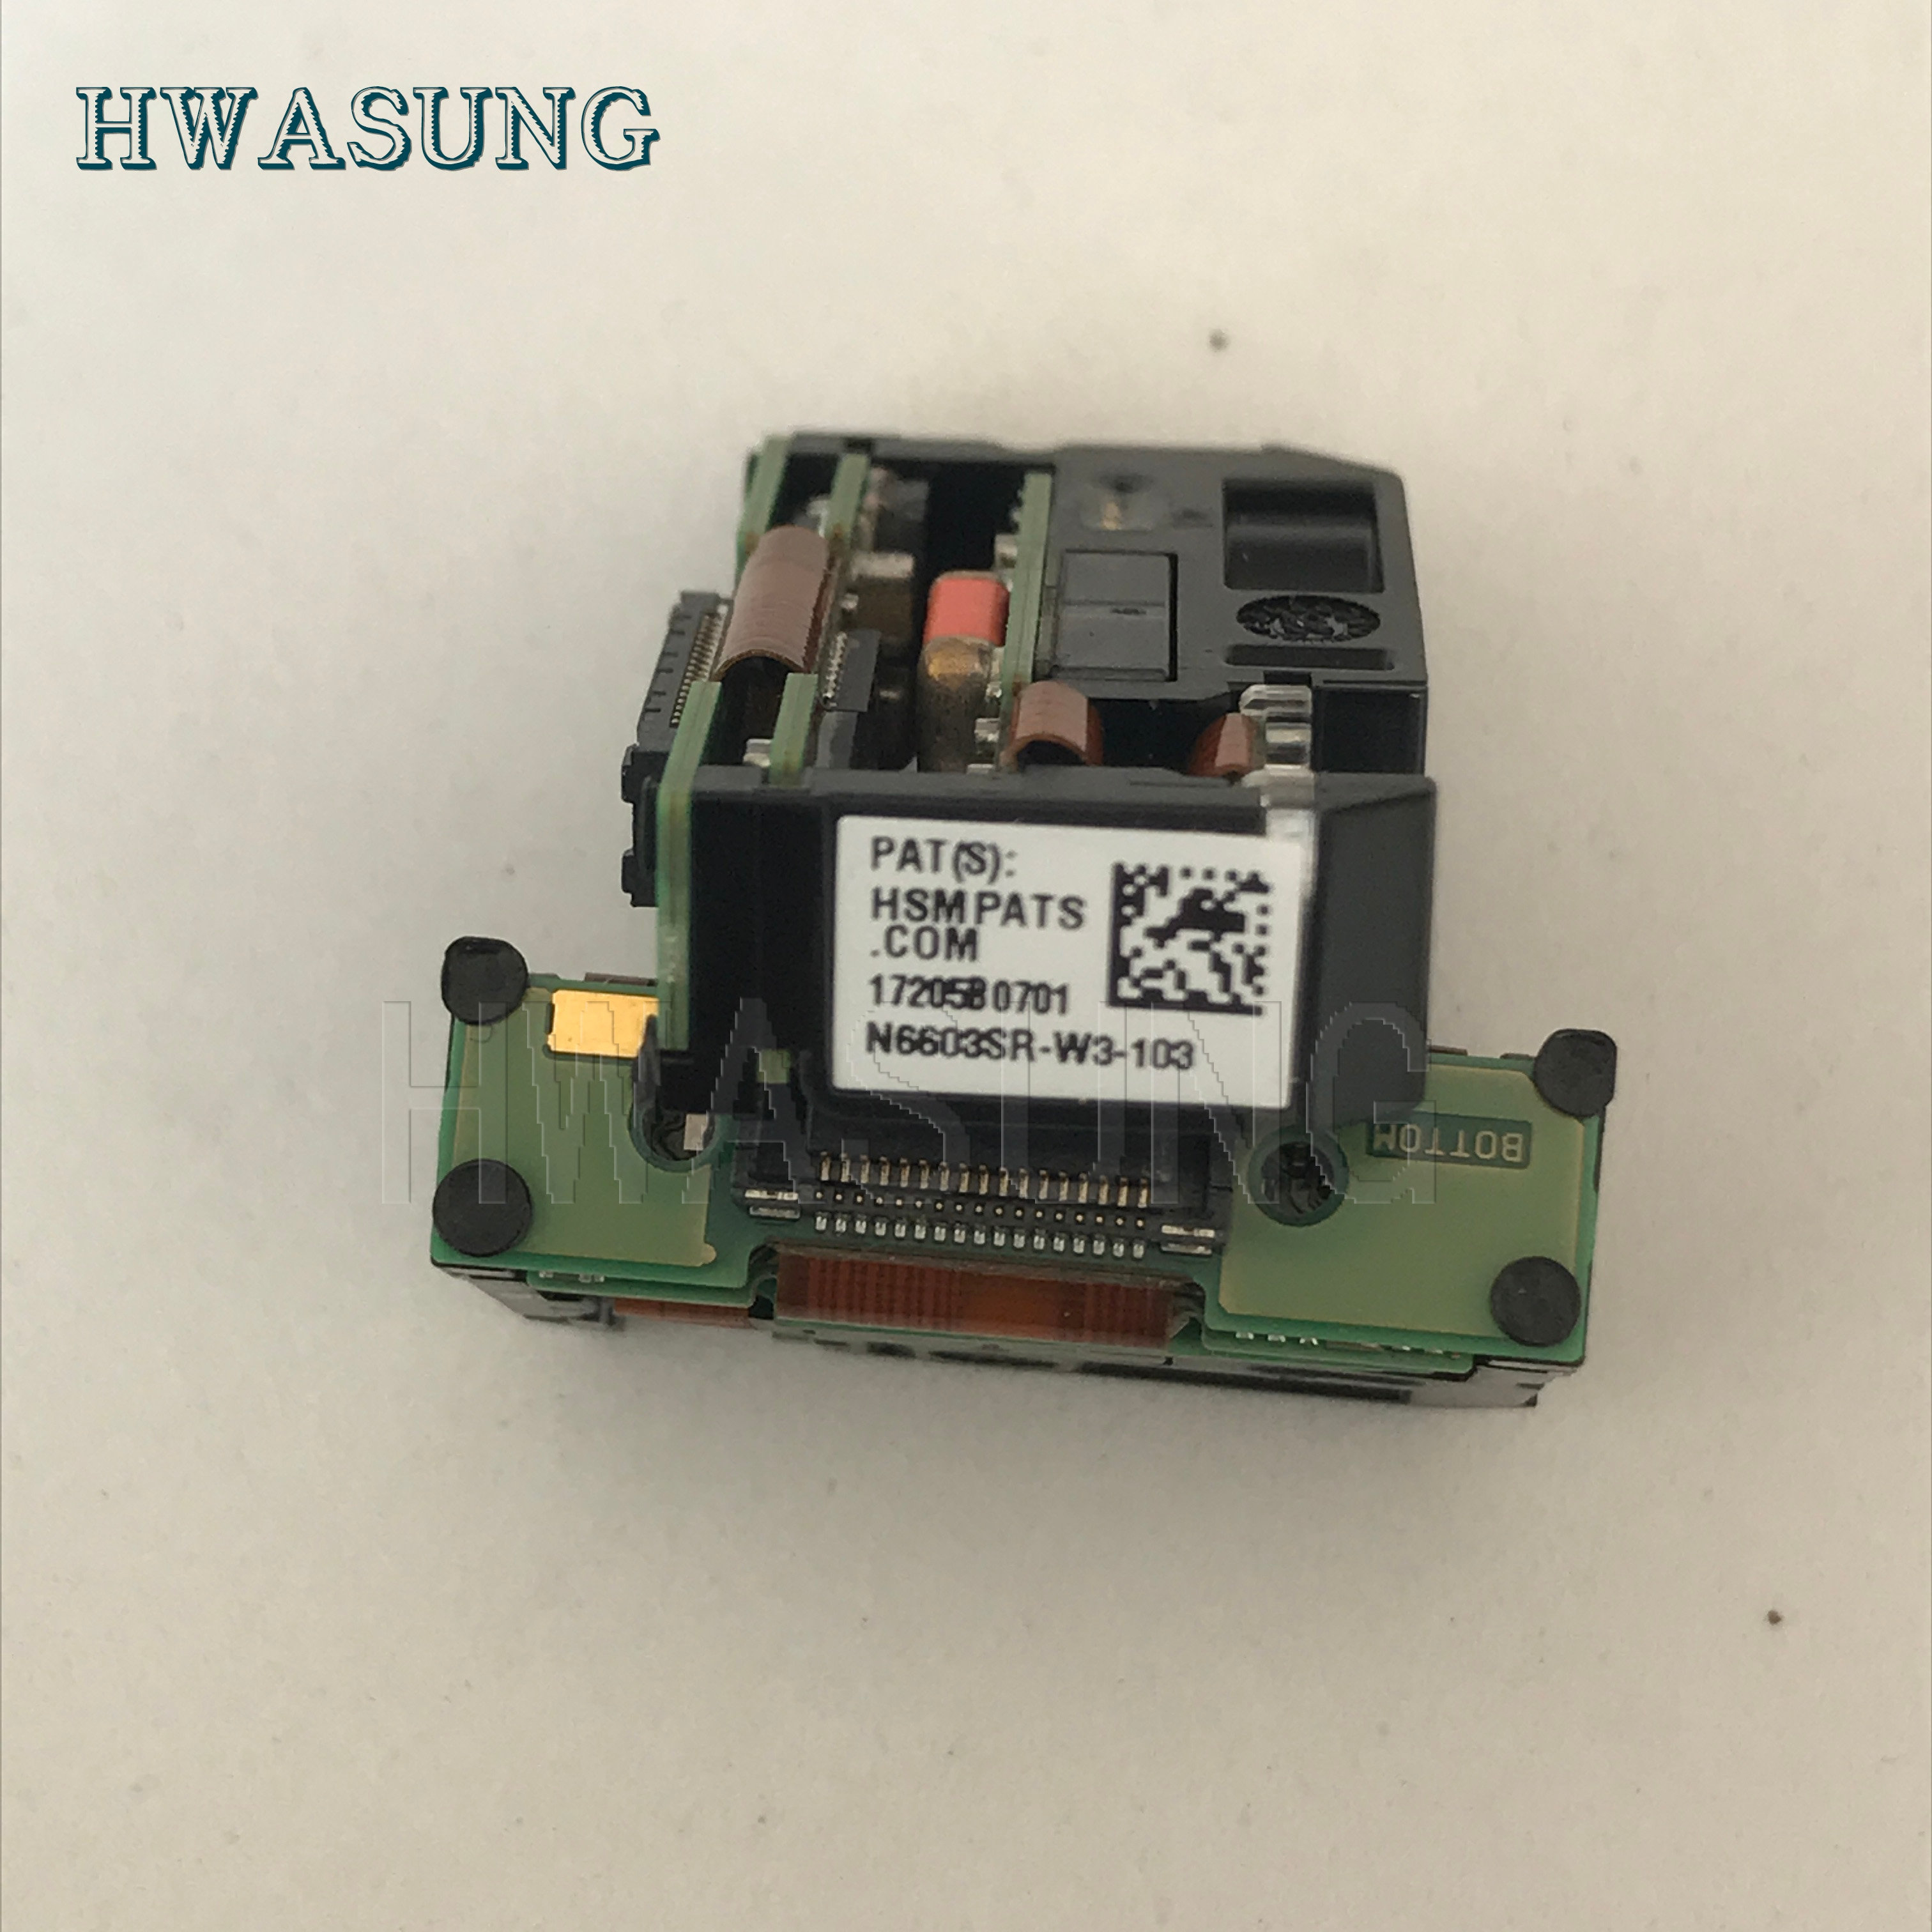 Barcode Scanner Engine (N6603SR-W3-103) for Honeywell LXE 8620 Ring Scanner or EDA51